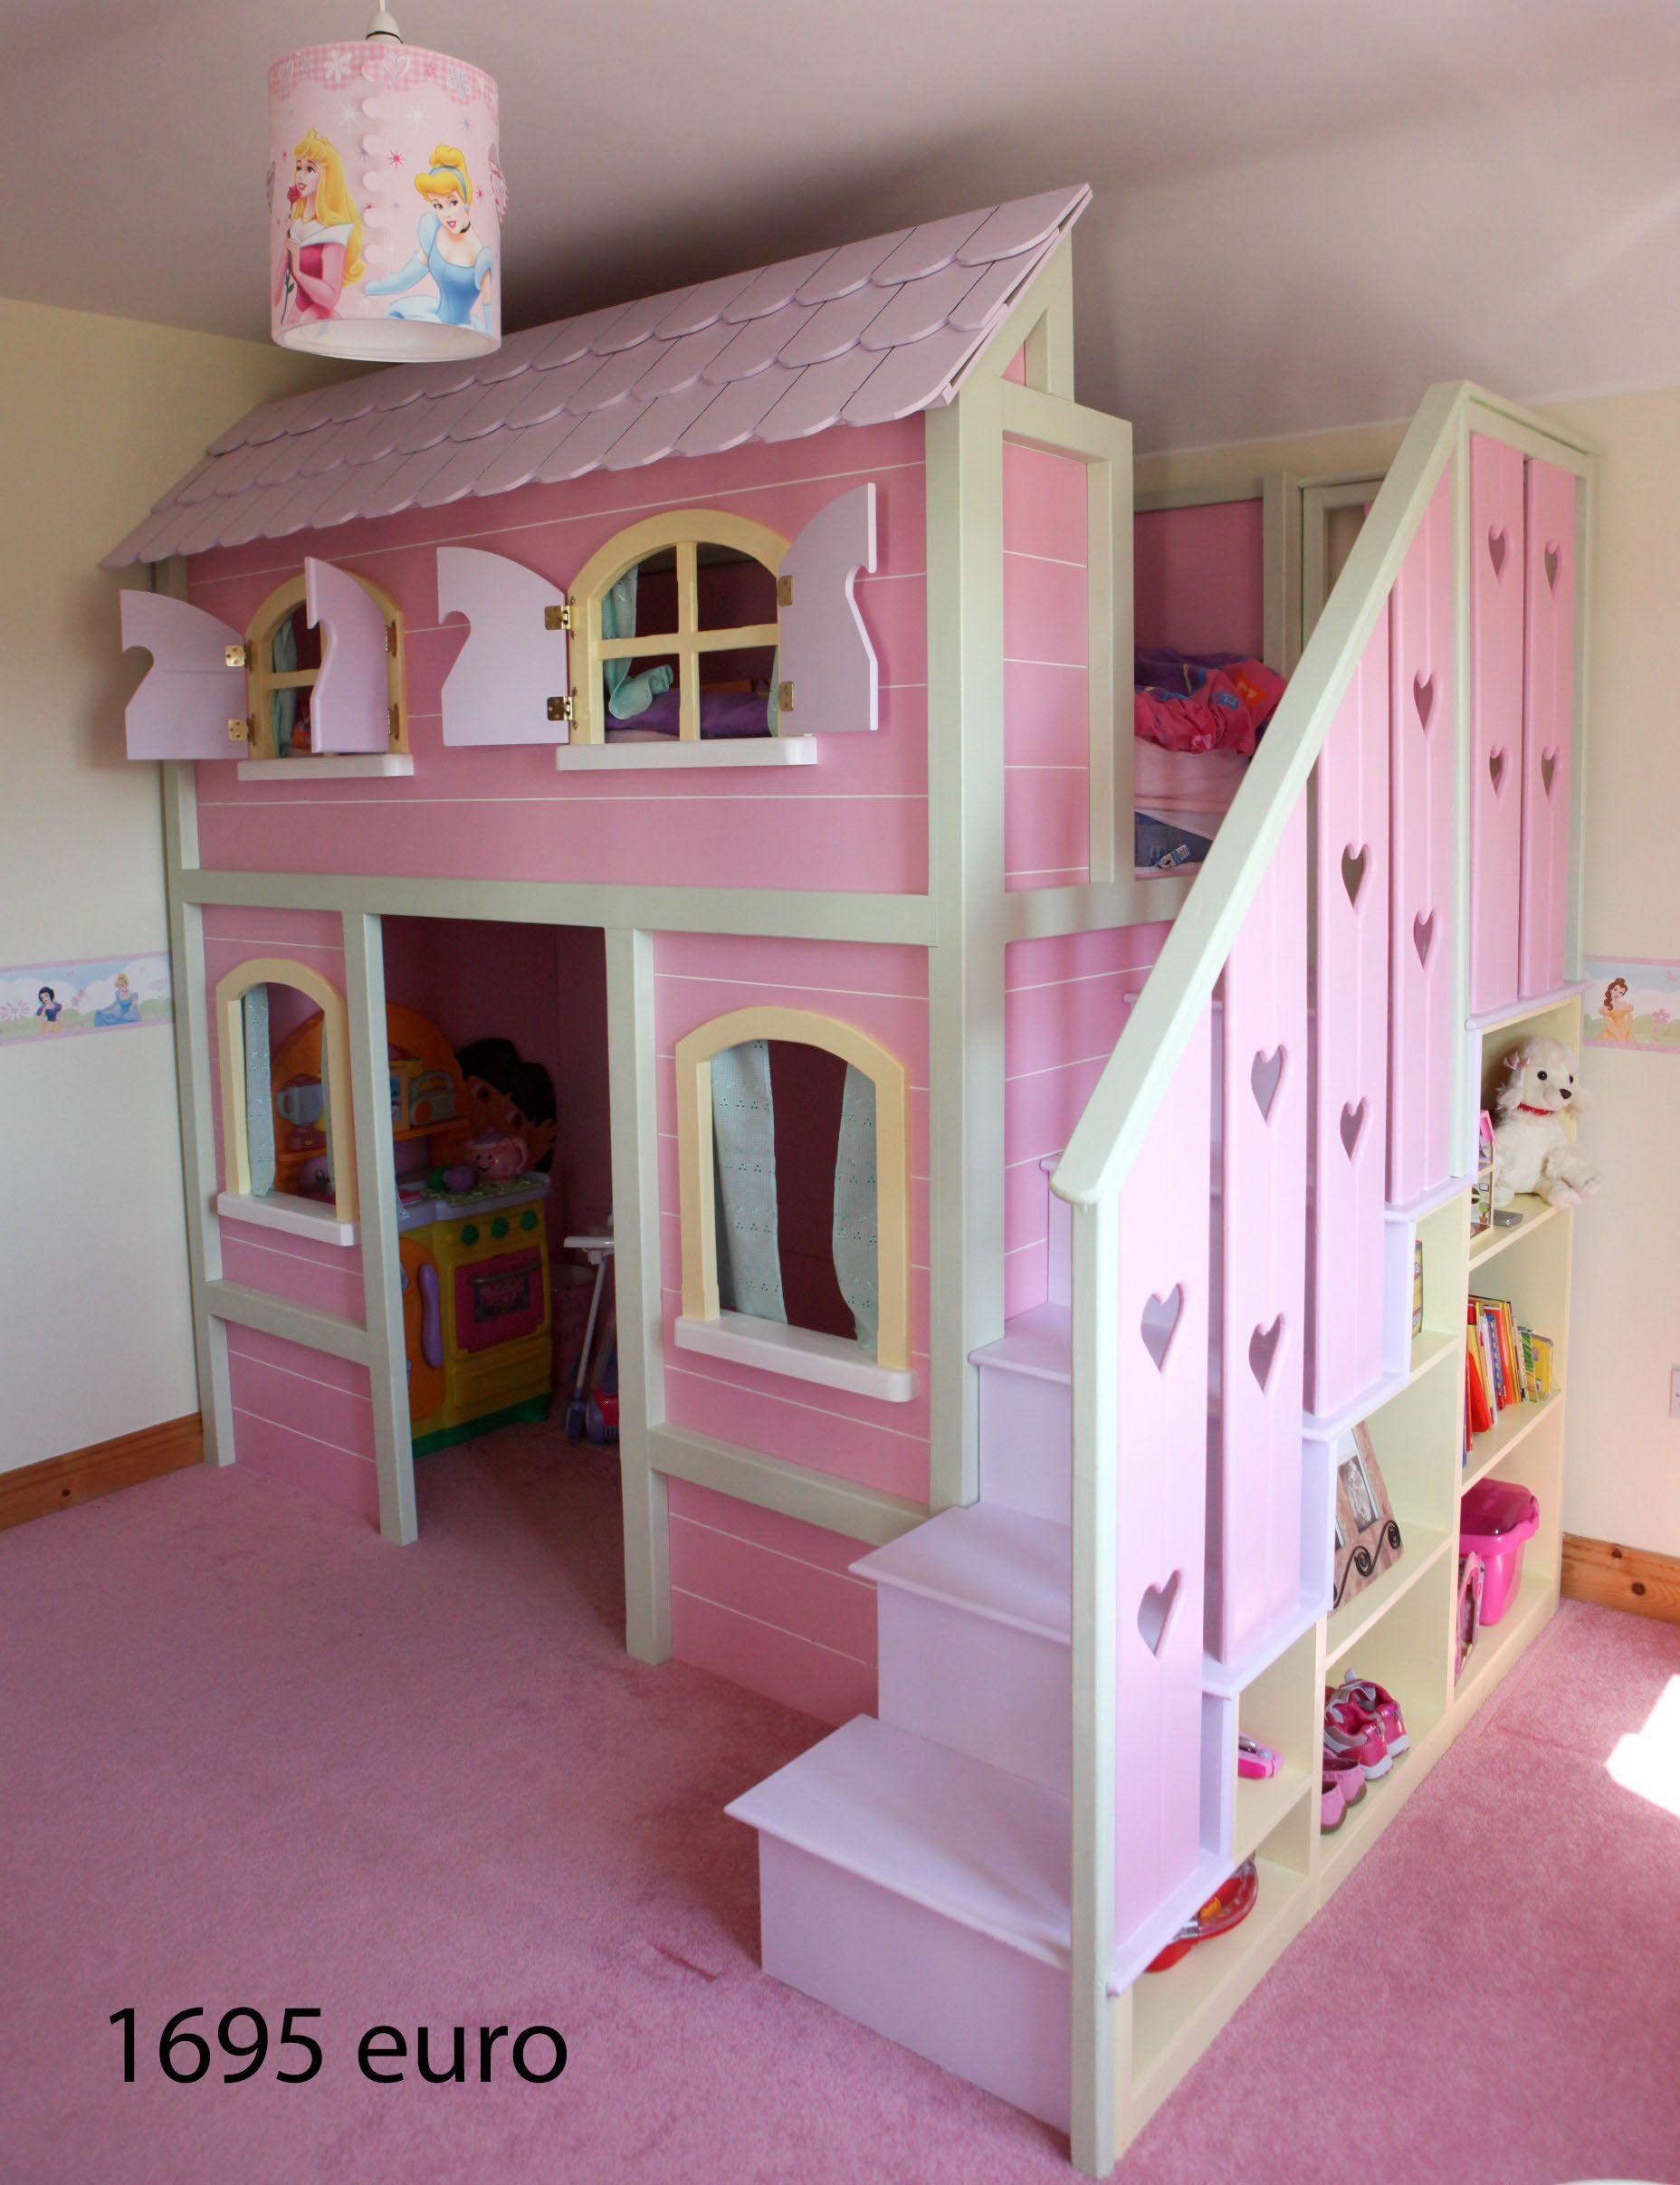 Mini loft bed with slide  Yarelis Diaz yarelisdiaz on Pinterest